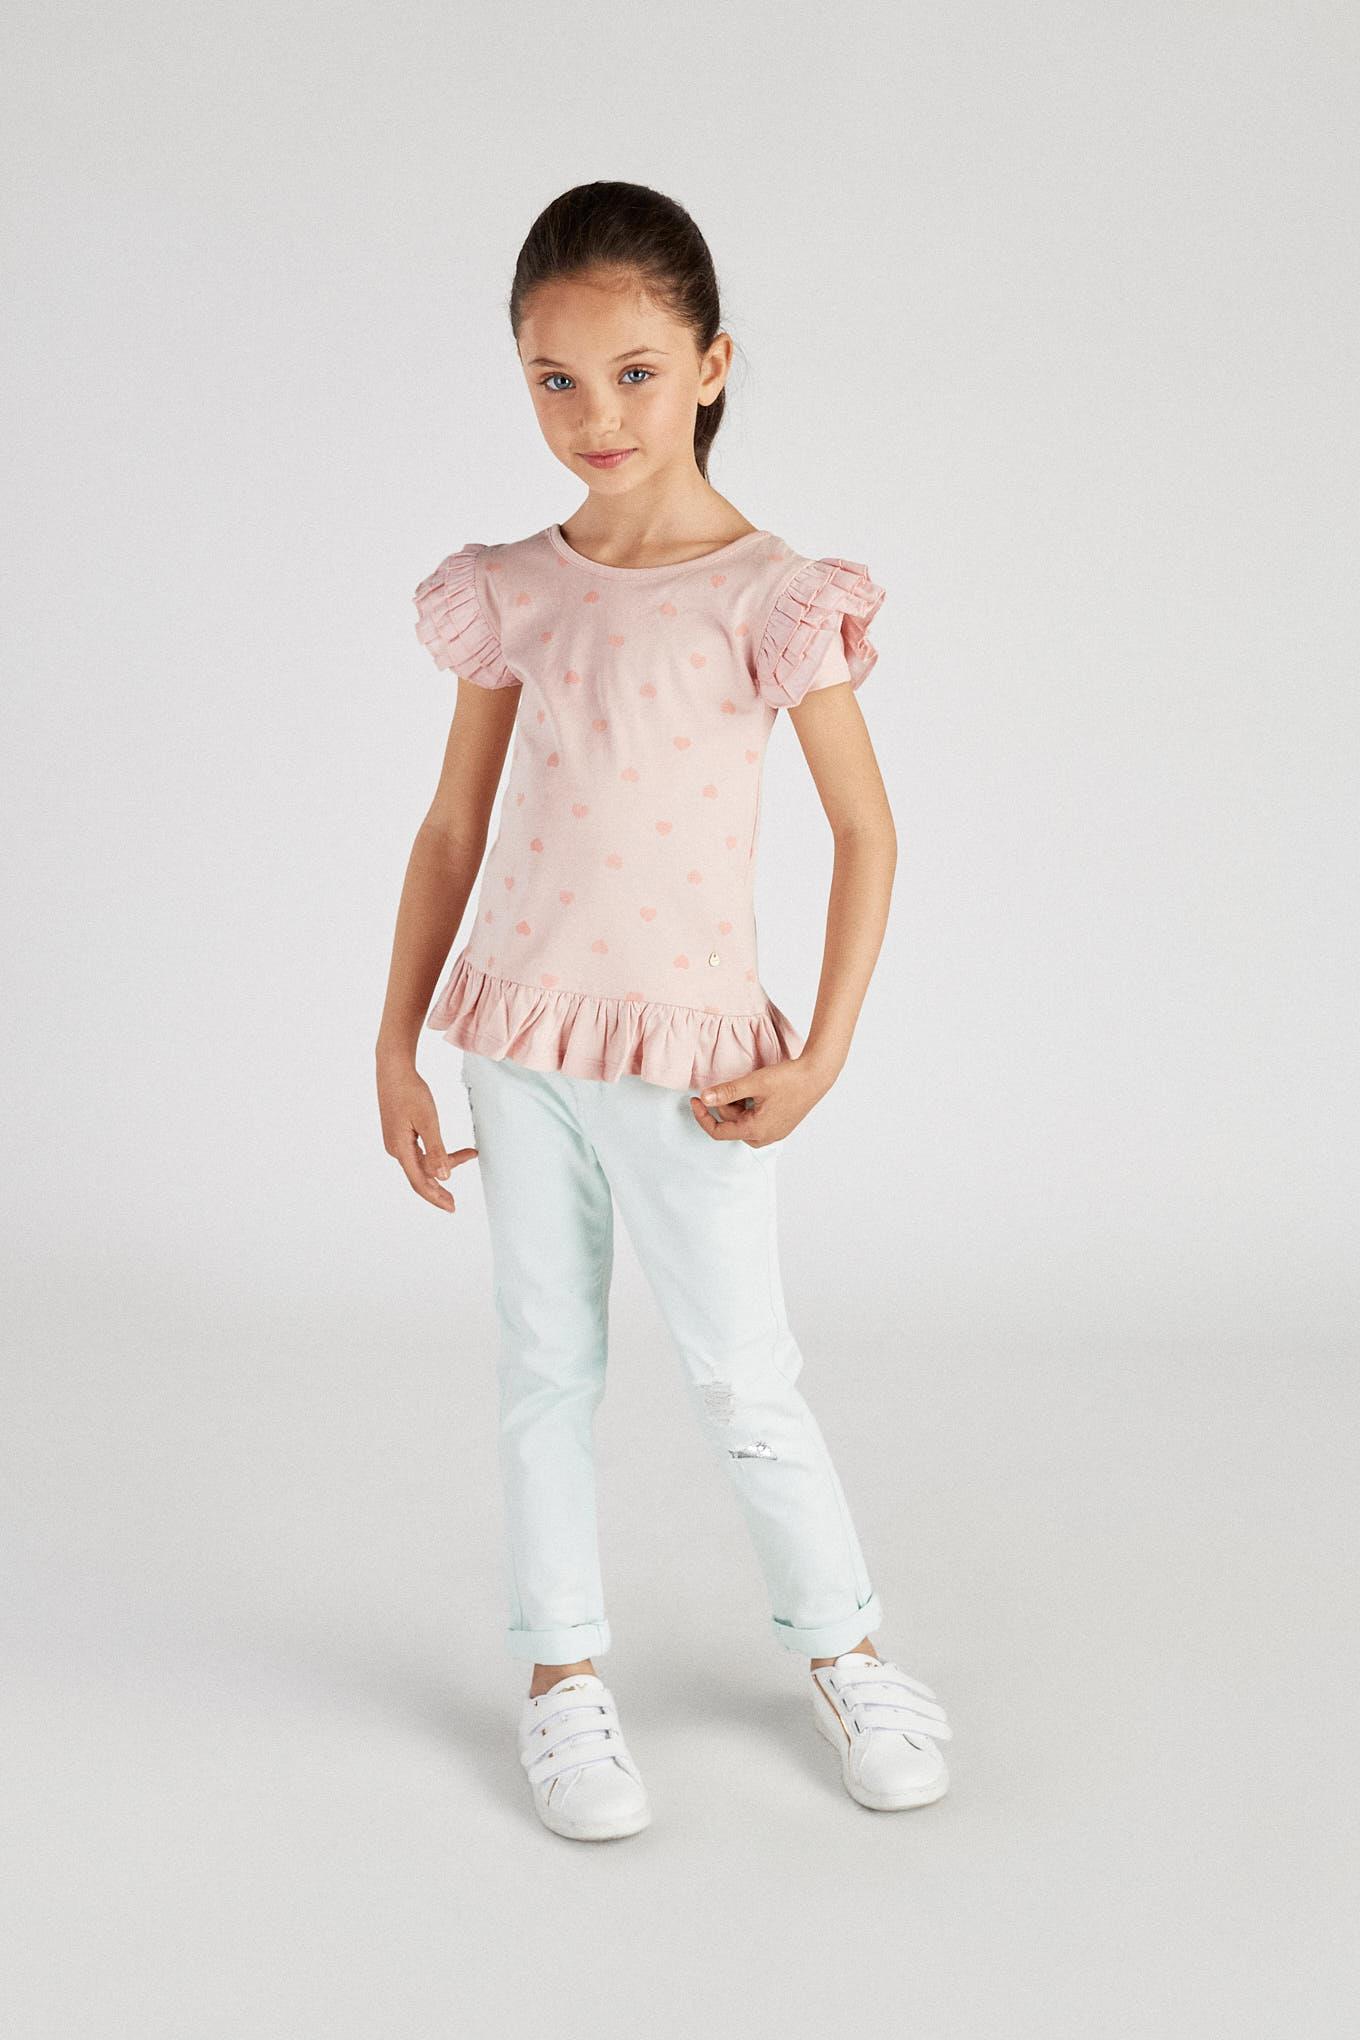 T-Shirt Rosa Sport Rapariga